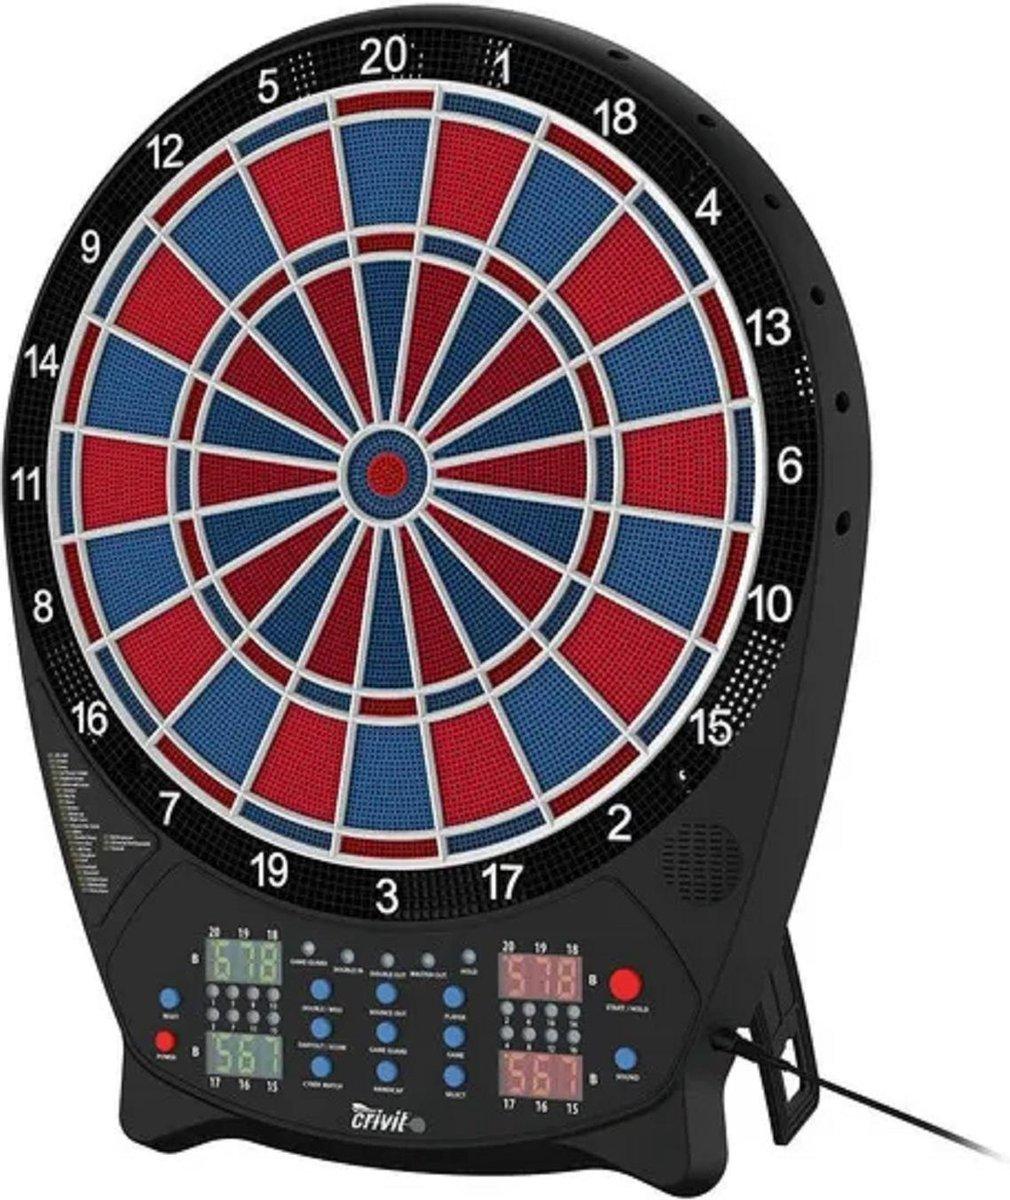 Elektrisch dartbord   dartbord - dartpijlen - dartmat - dartborden - elektronisch - darts accesoires - dart assecoires